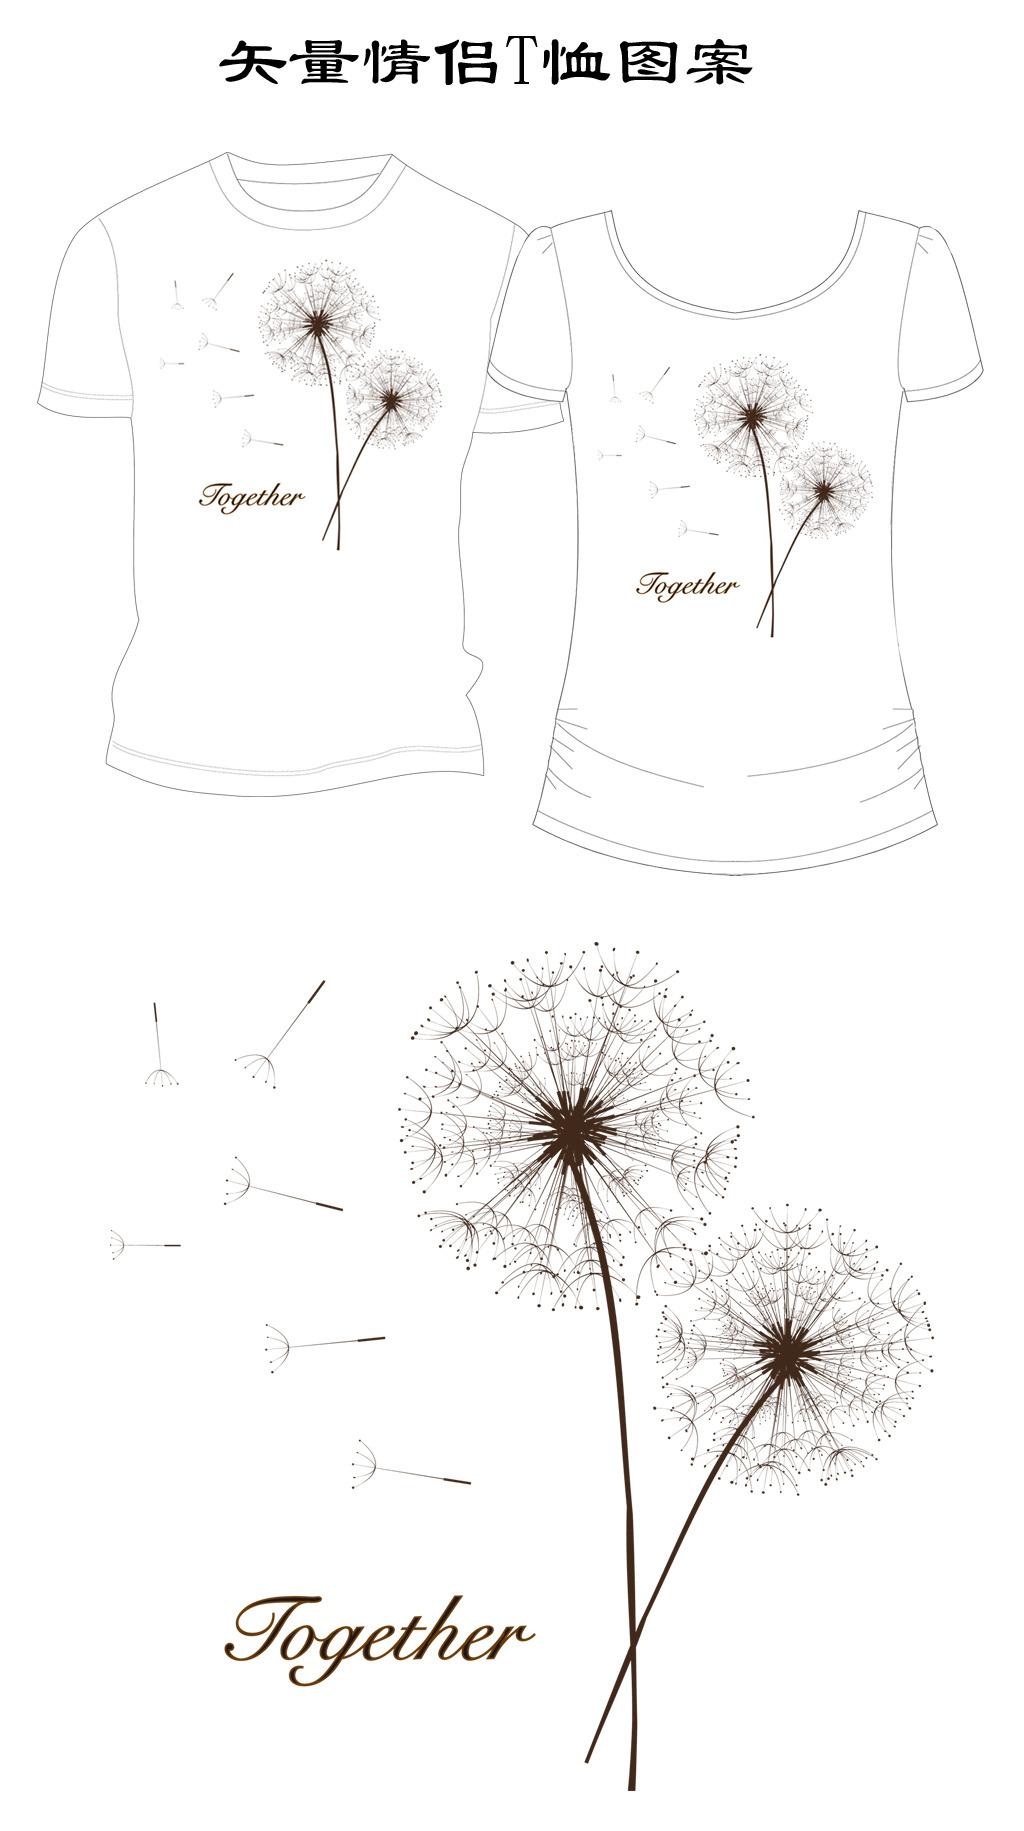 t恤设计模板 个性 t恤设计图 t恤图案矢量 印花设计 t恤设计图案 t恤